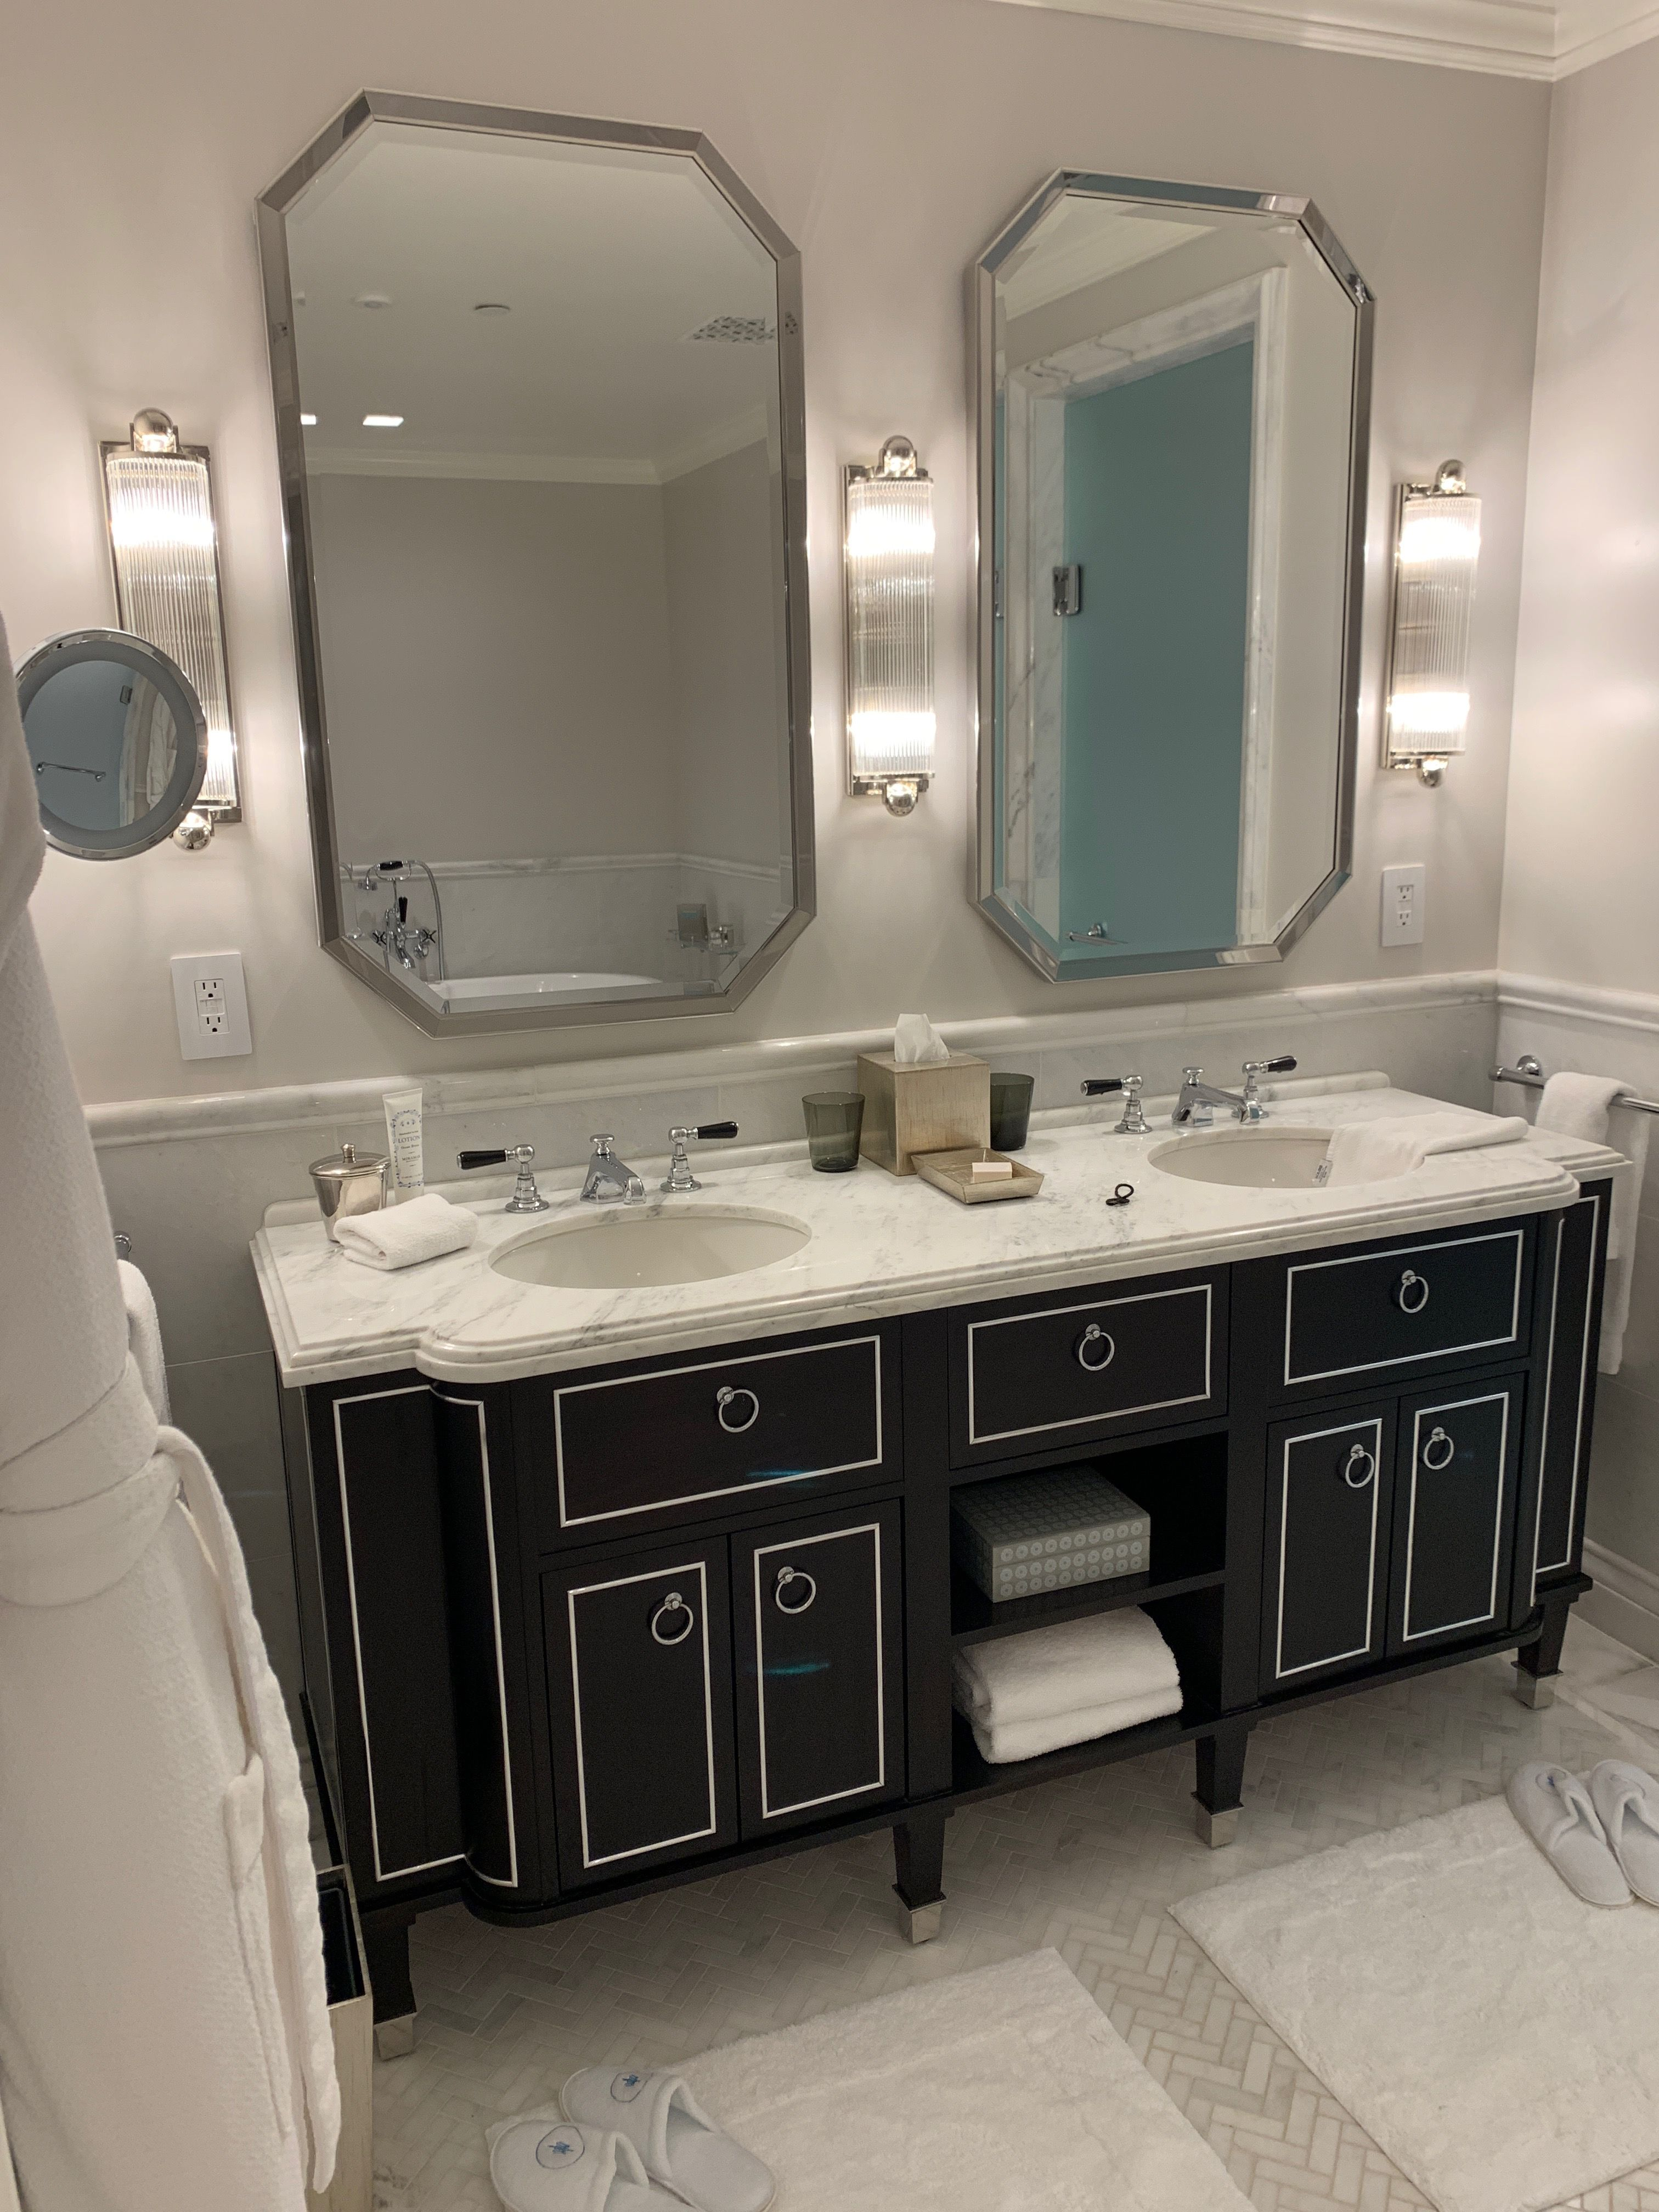 Pin By Meredith Shachoy On 90 Thorndike Bathroom Mirror Bathroom Vanity Bathroom [ 4032 x 3024 Pixel ]